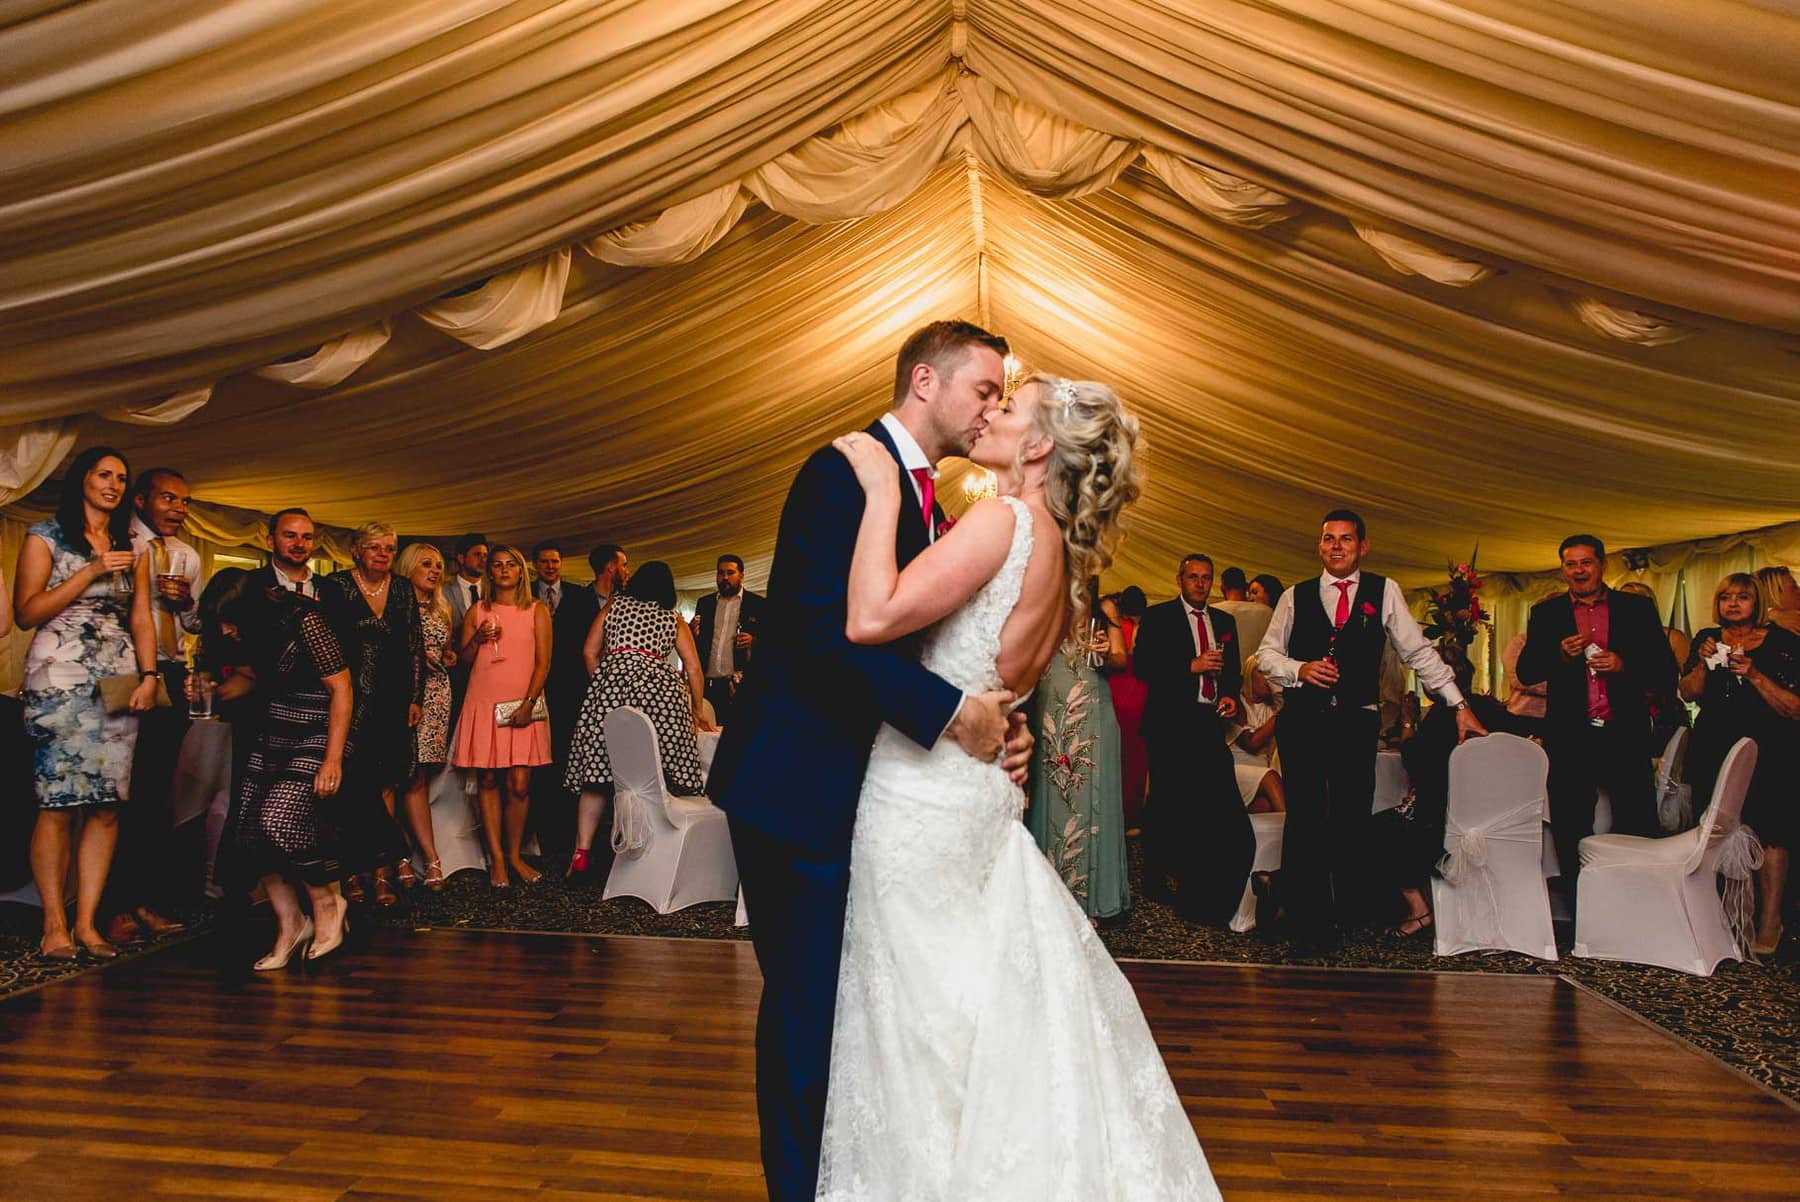 Tanya and Matthew's Bali Wedding Celebration at Newhall Hotel